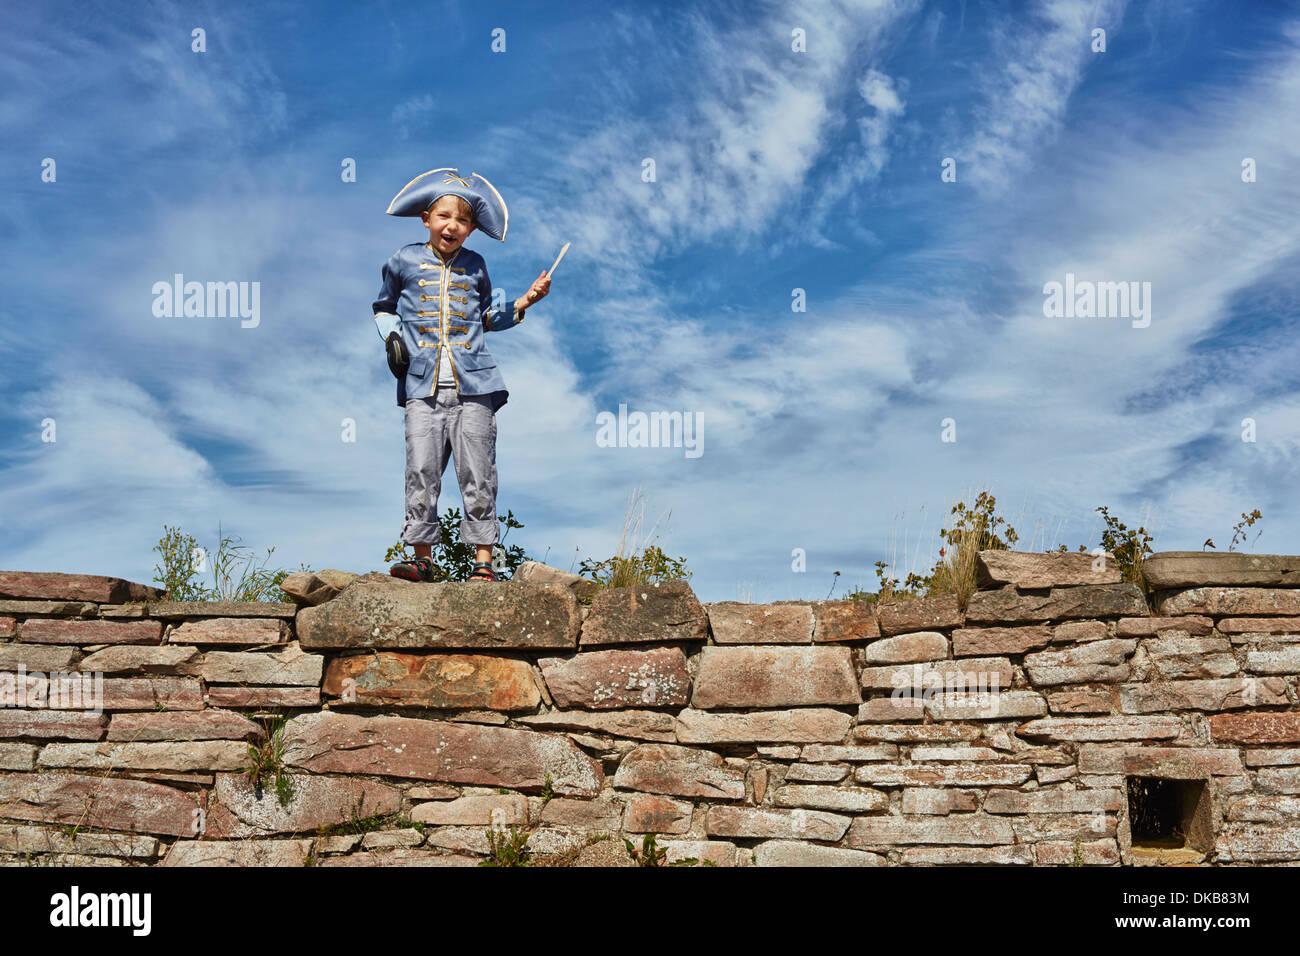 Boy wearing pirate costume, Eggergrund, Sweden - Stock Image